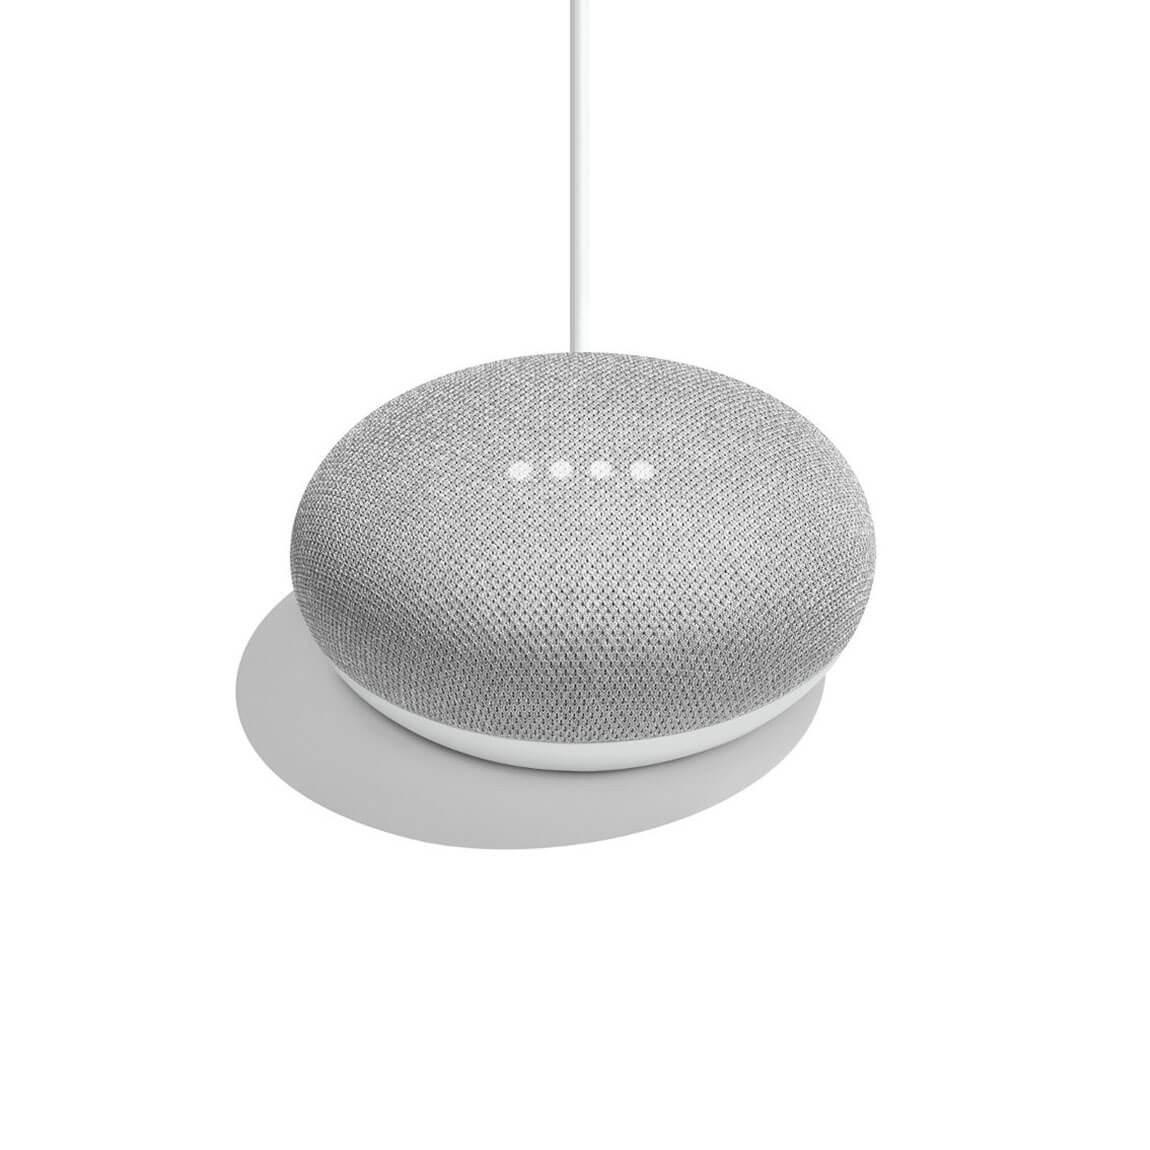 Google Home Mini Sprachassistent in hellgrau